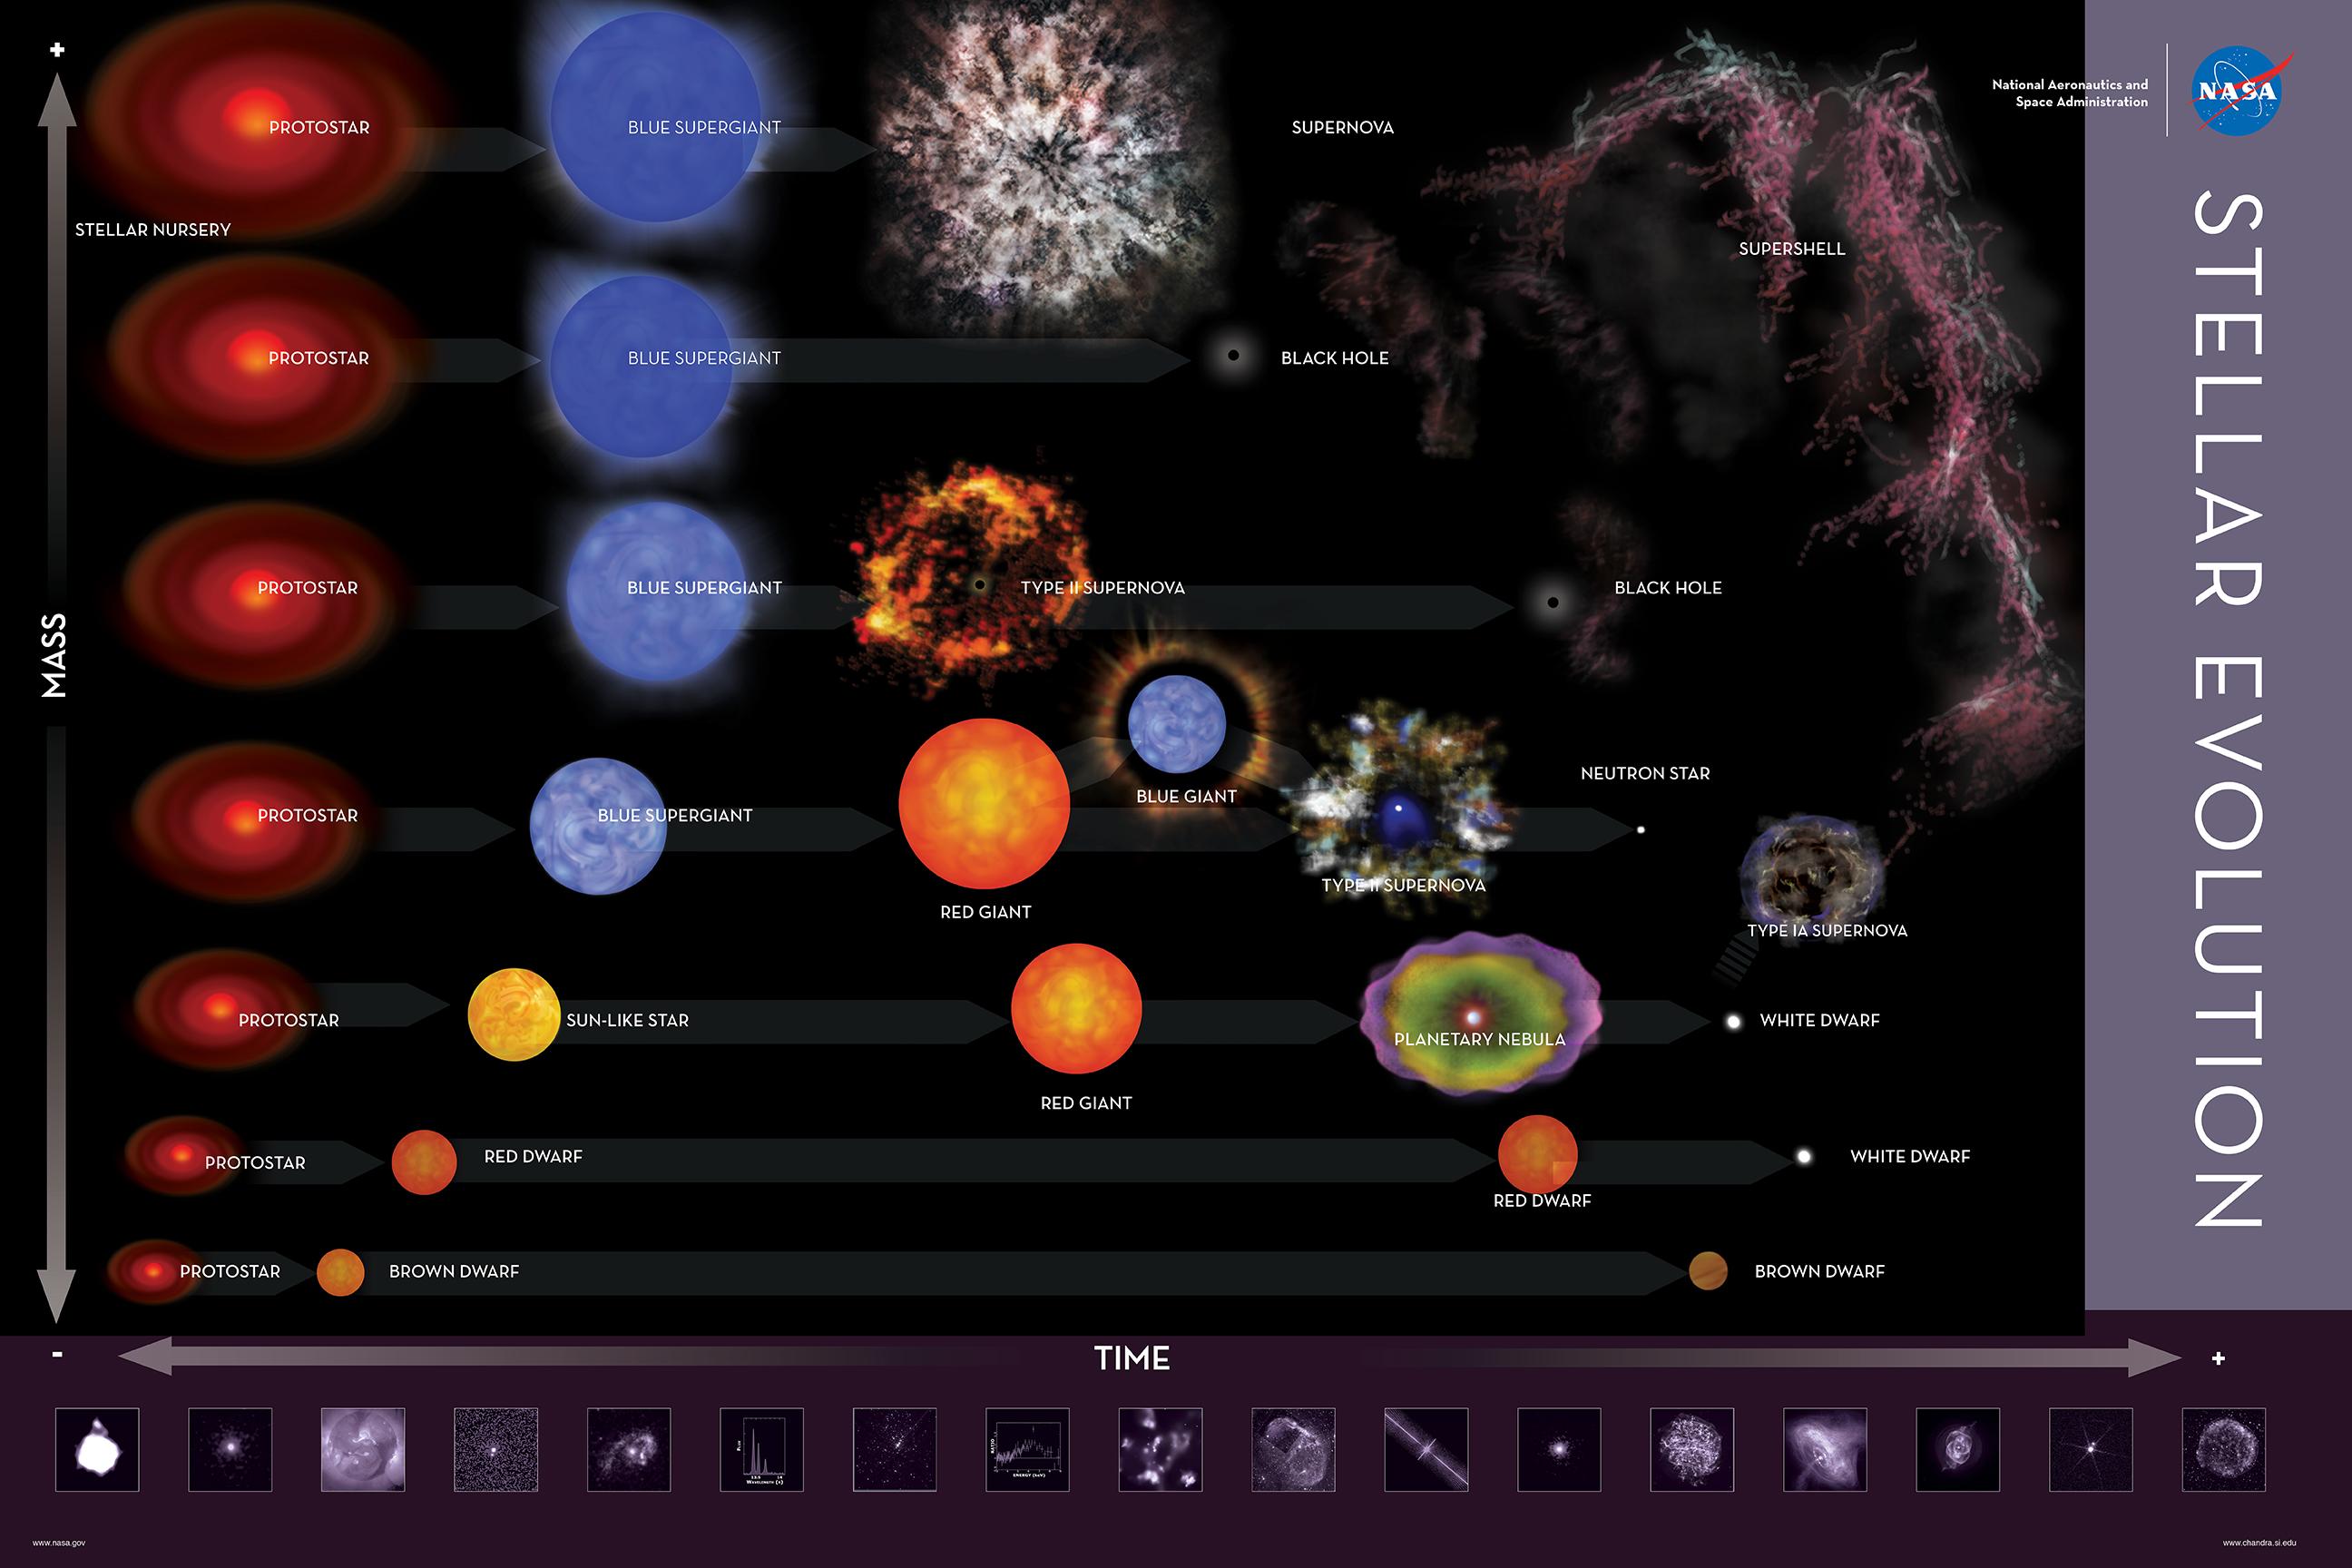 https://i1.wp.com/chandra.harvard.edu/mess/images/prod_thumbs/Stellar_Evolution_Poster.jpg